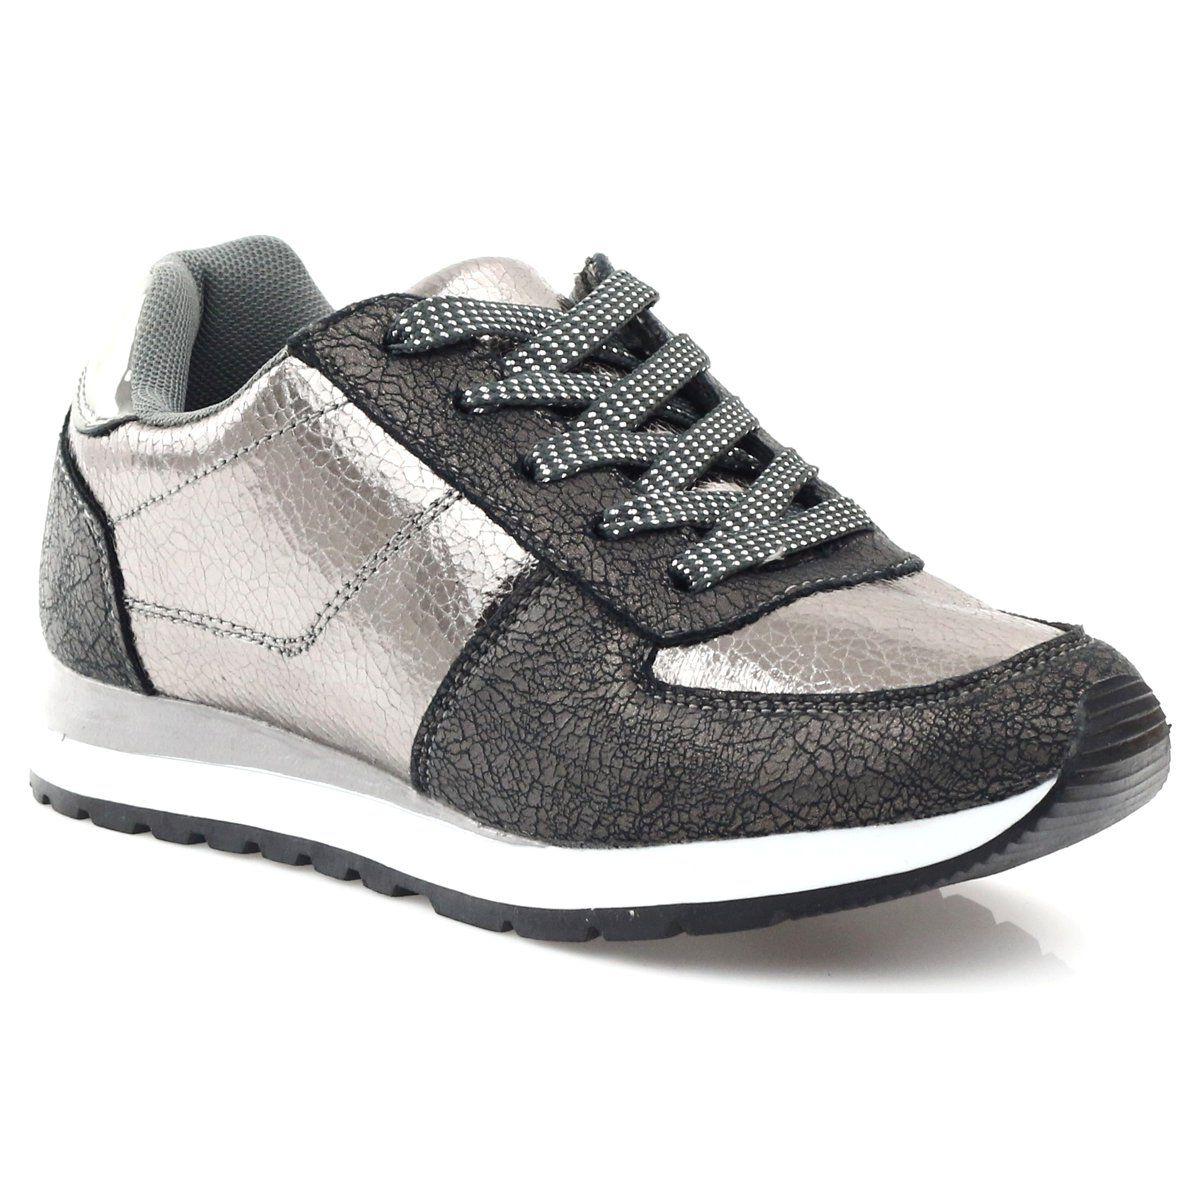 Mcarthur Buty Sportowe Miedziane Szare Sneakers Shoes Fashion